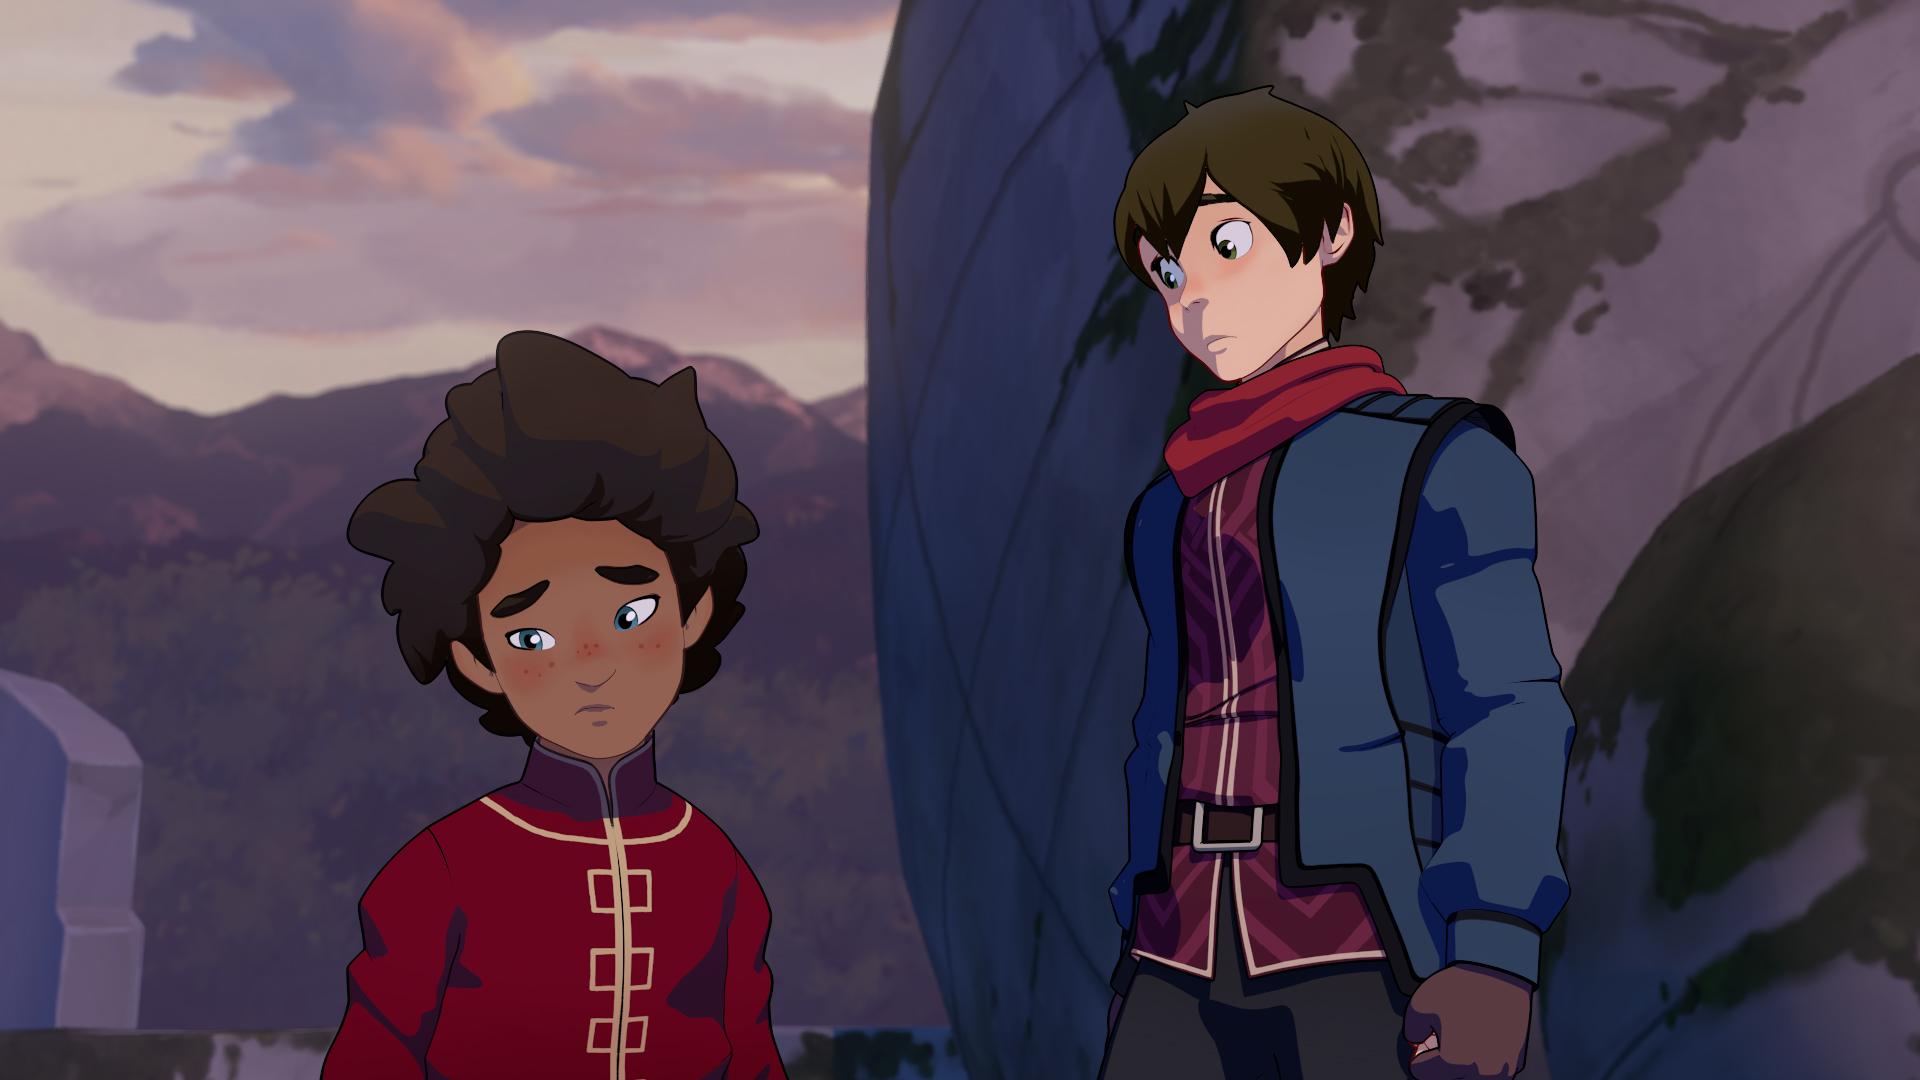 The Dragon Prince - Callum and Ezran look uncertain